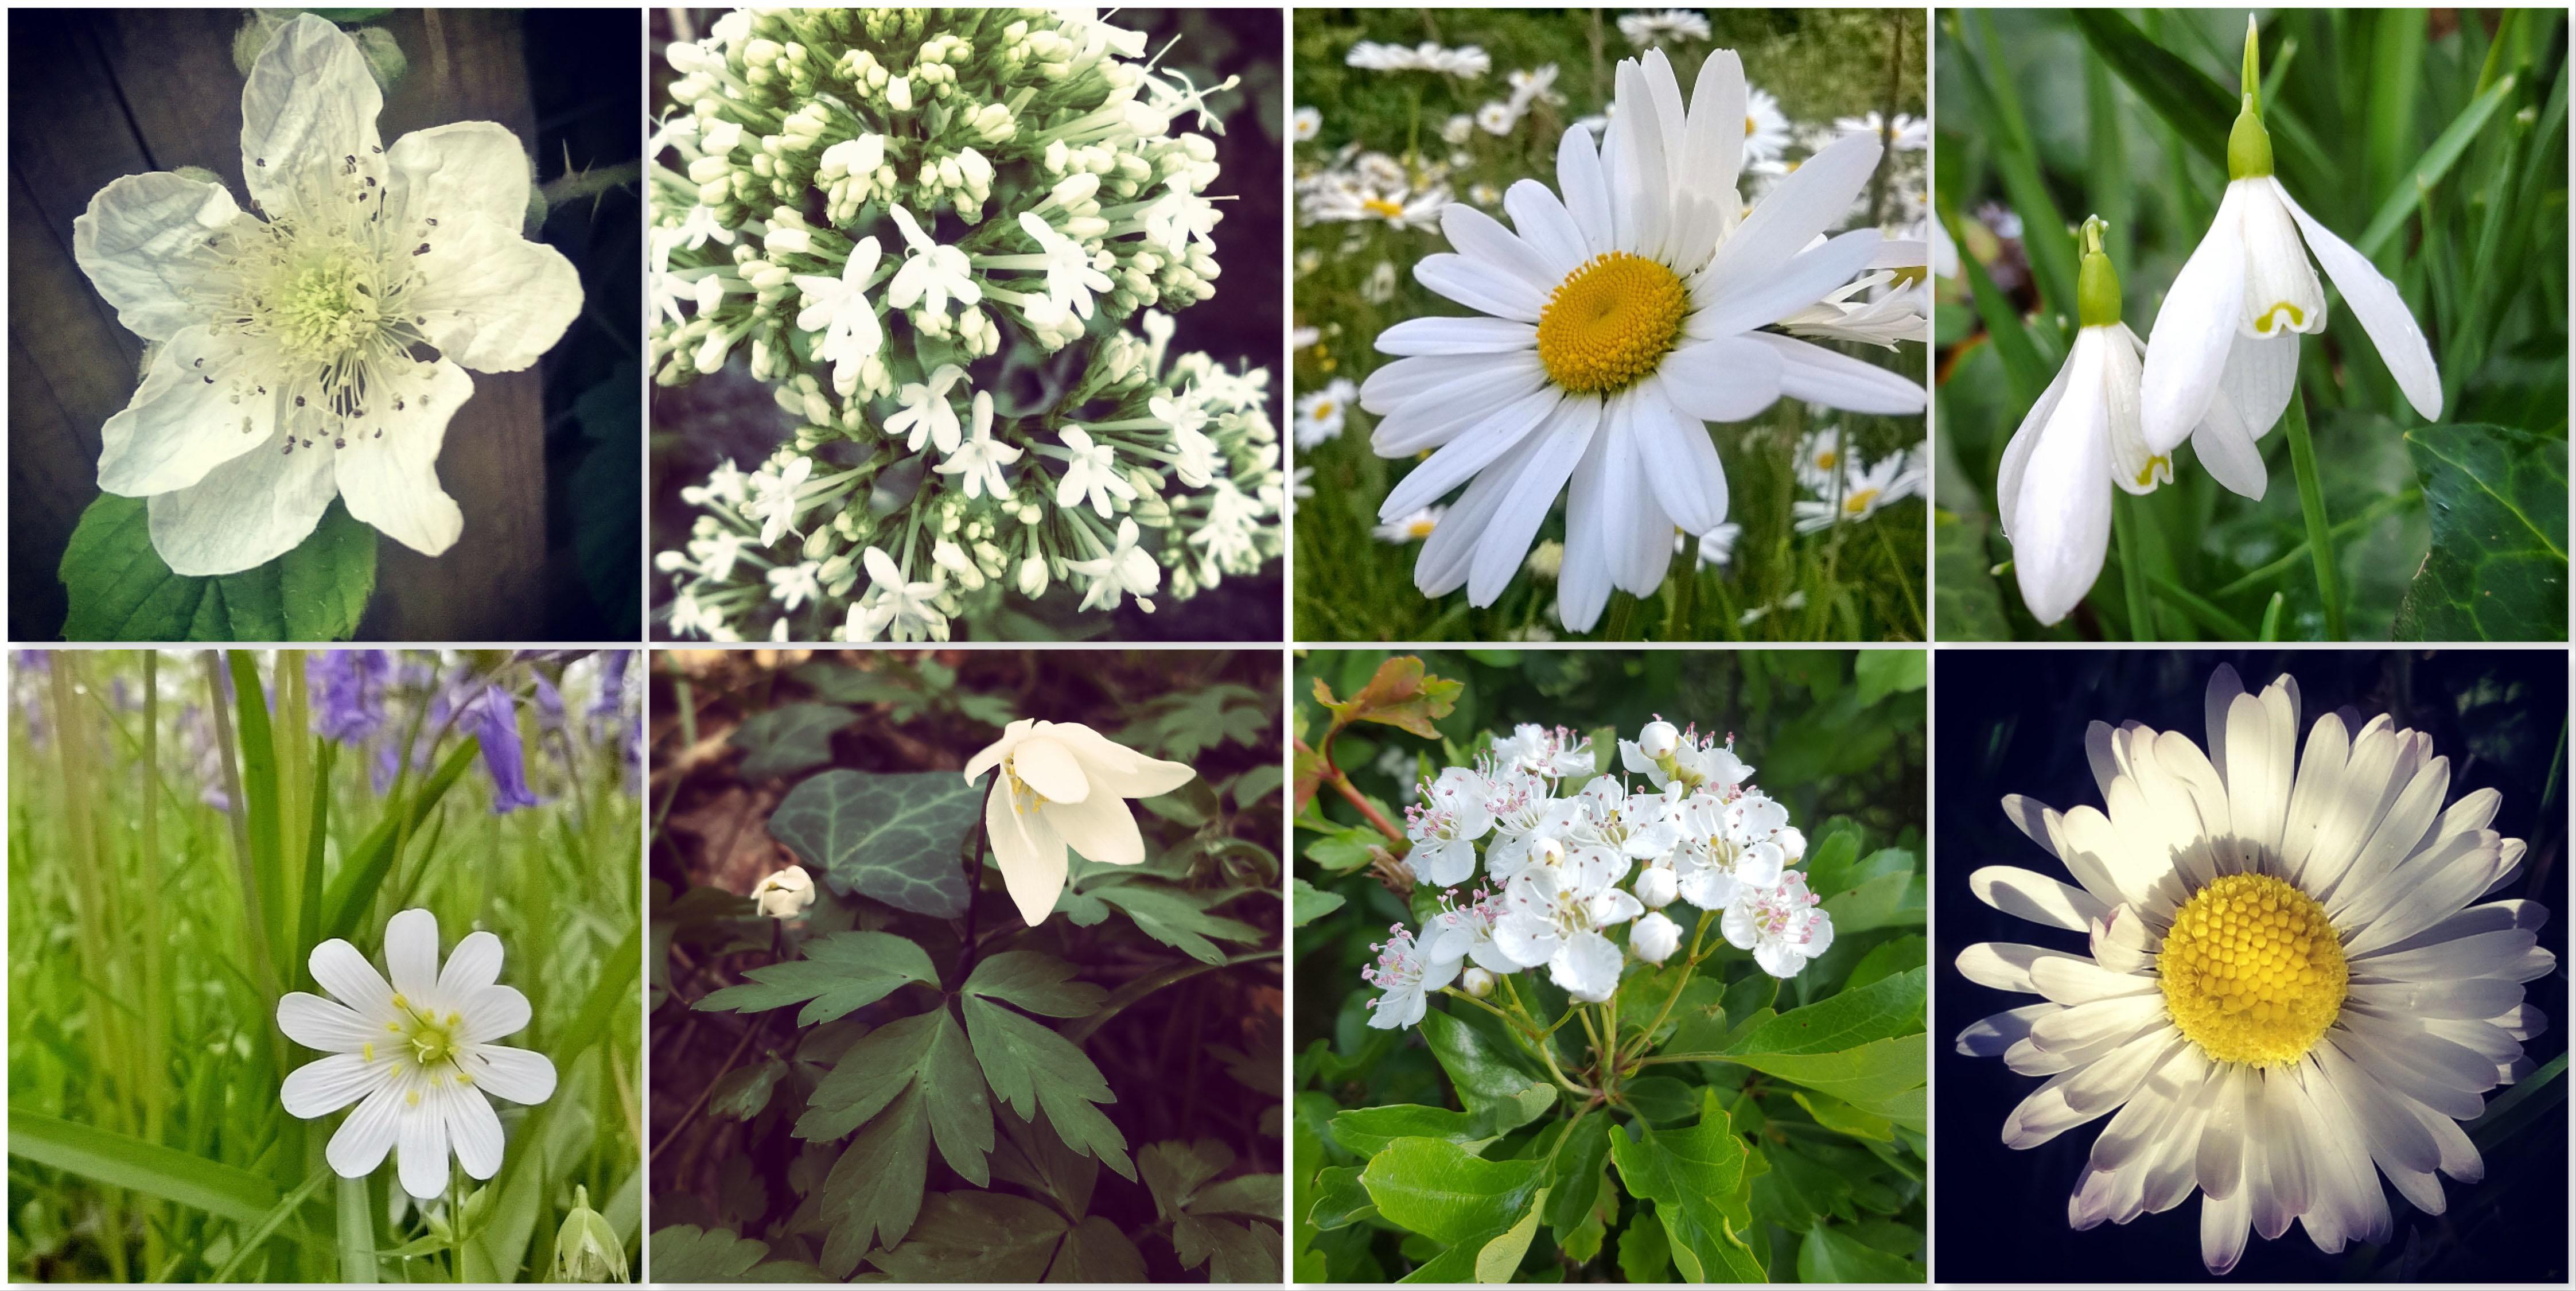 Blackberry - Valerian - Ox-eye Daisy - Snowdrop - Stitchwort - Wood Anemone - May Blossom - Daisy